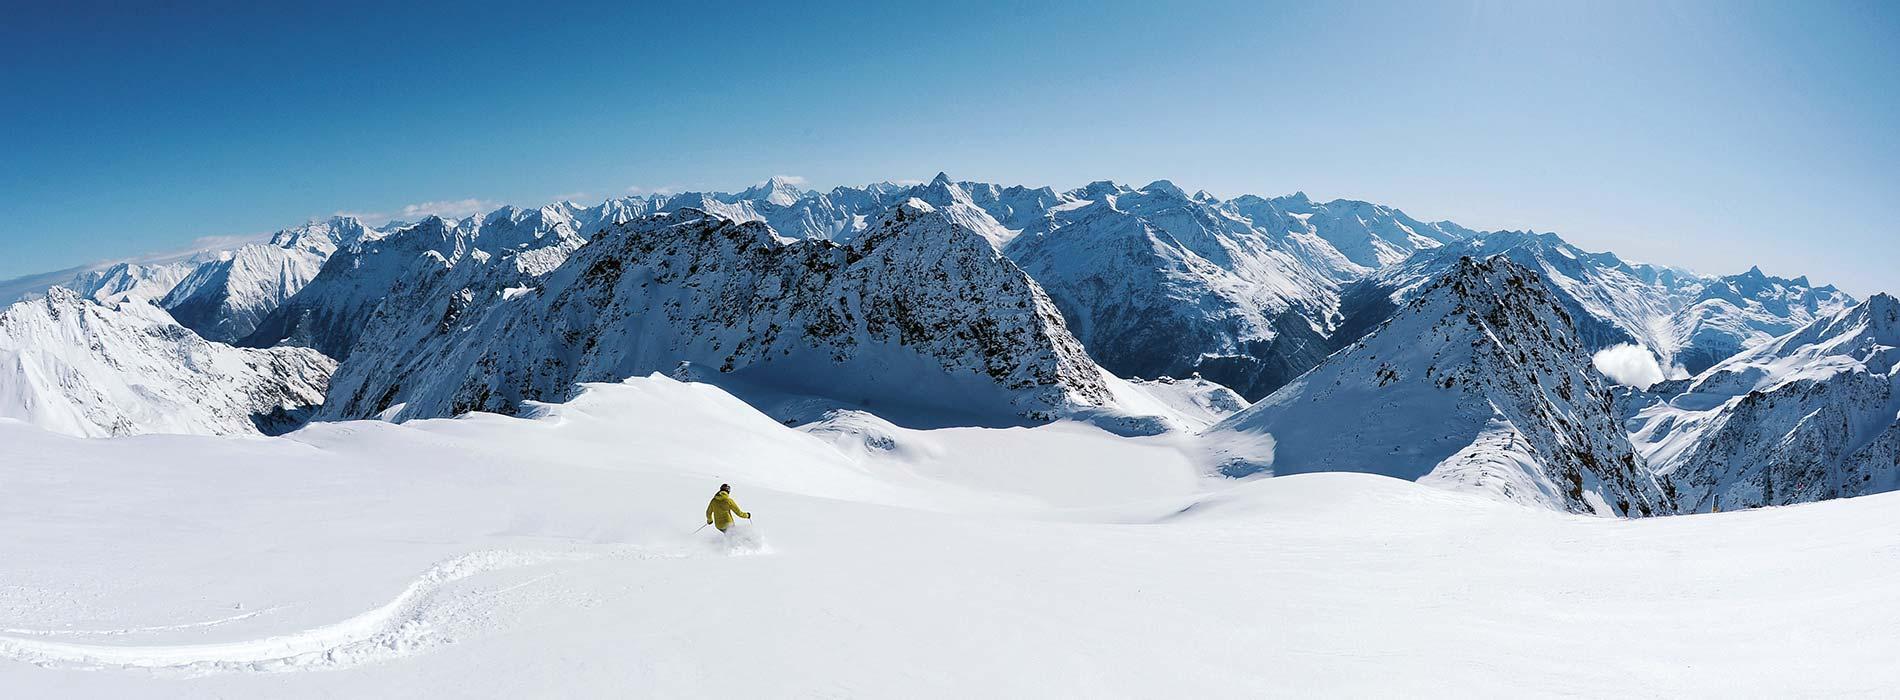 Skipass Ehe Obergurgl Hochgurgl Sölden Skifahren und Skiurlaub im Ötztal